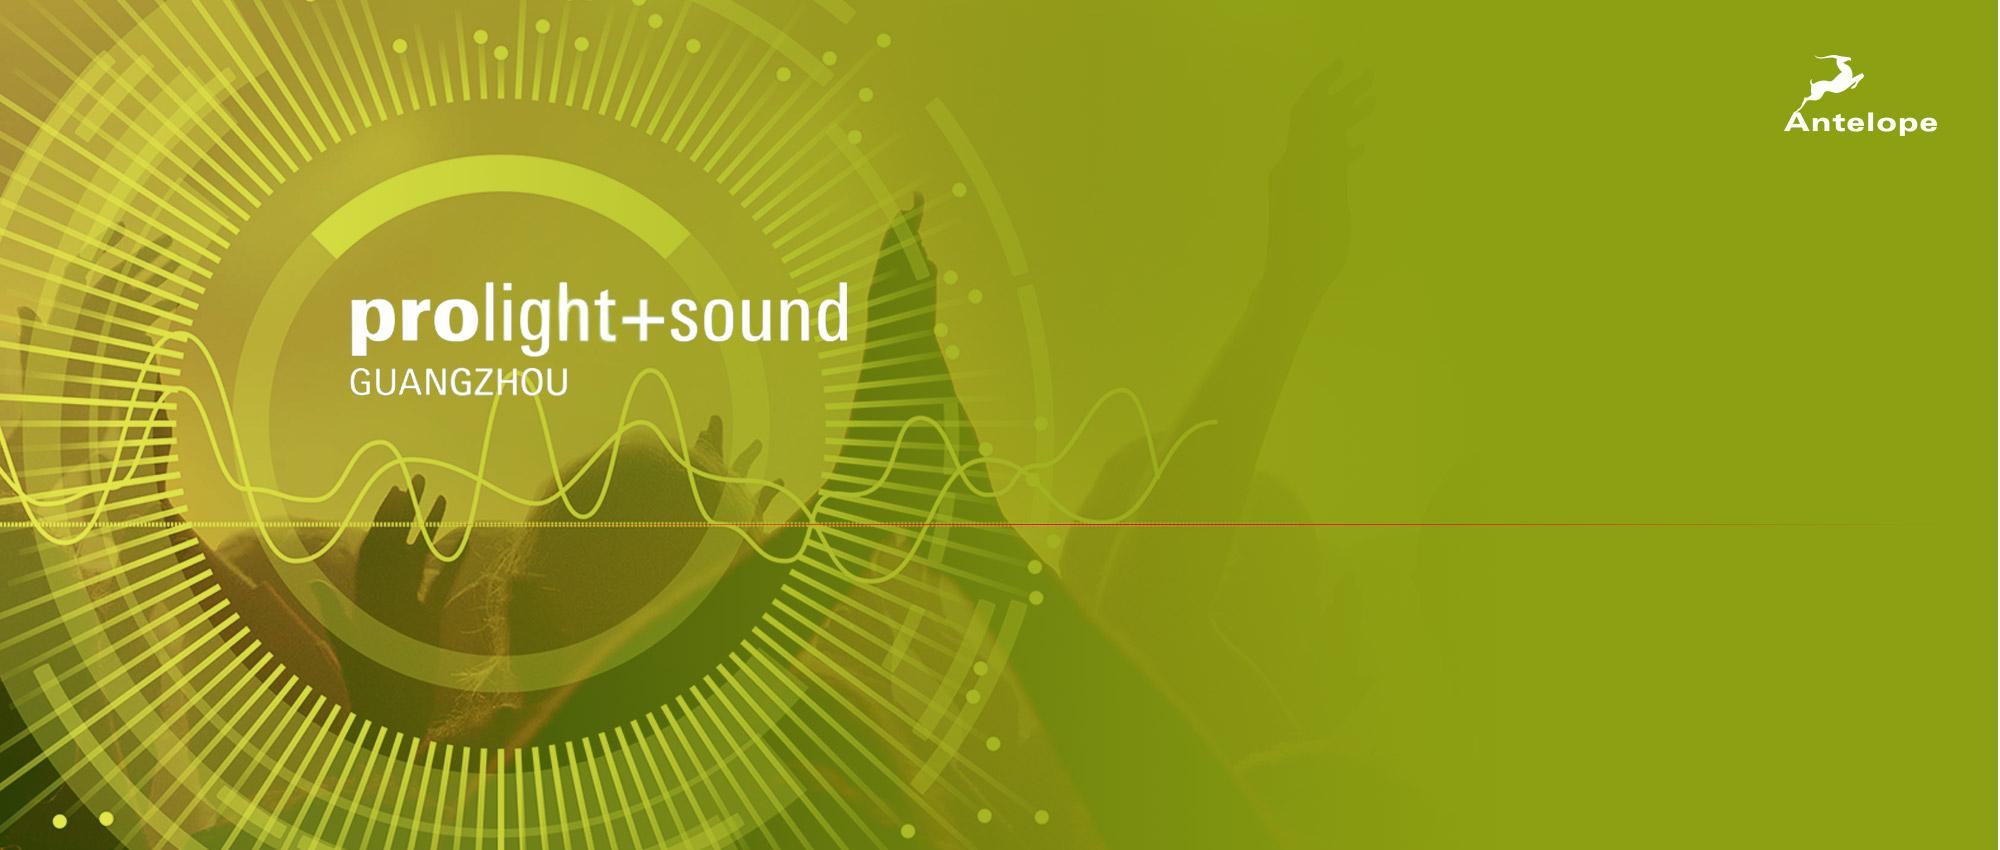 Join Antelope Audio on Prolight + Sound Guangzhou 2018